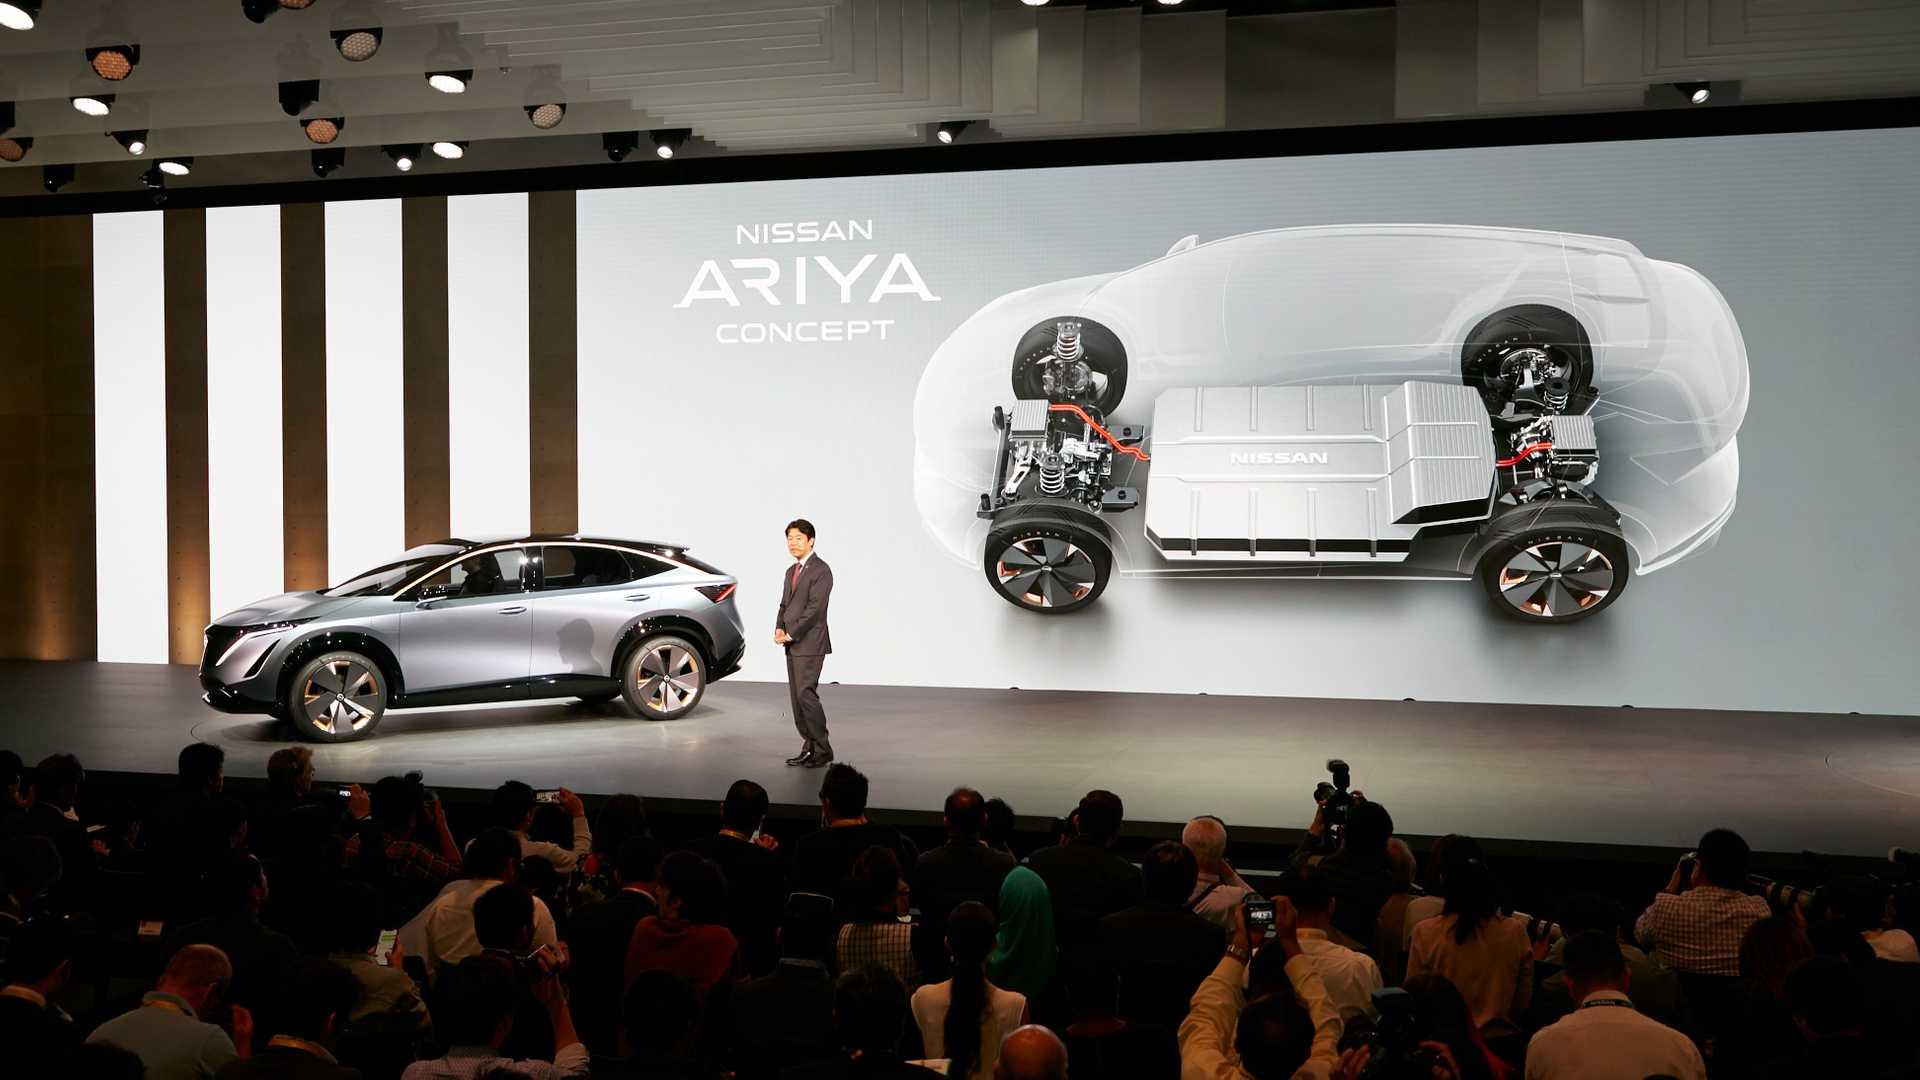 Nissan Ariya будет представлен 15 июля 2020 года